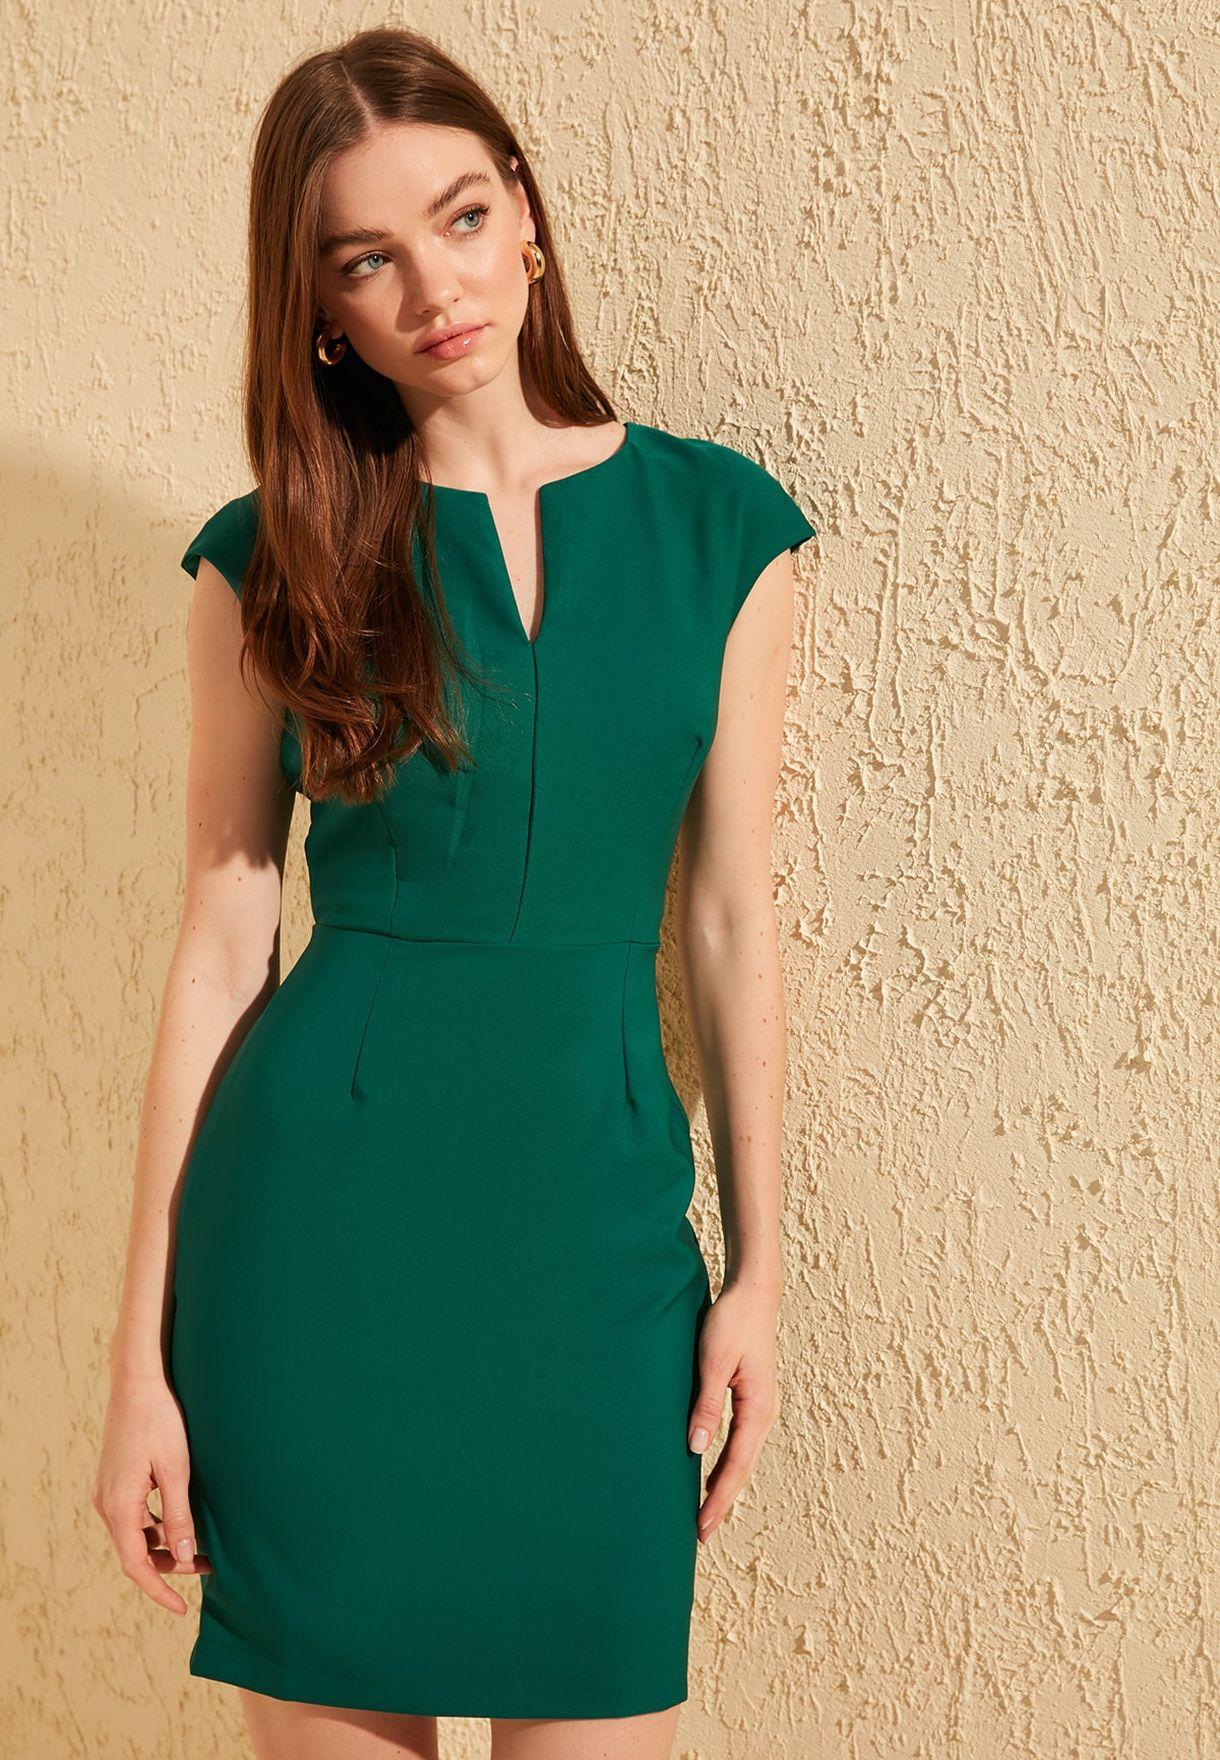 Notch Neck Bodycon Dress